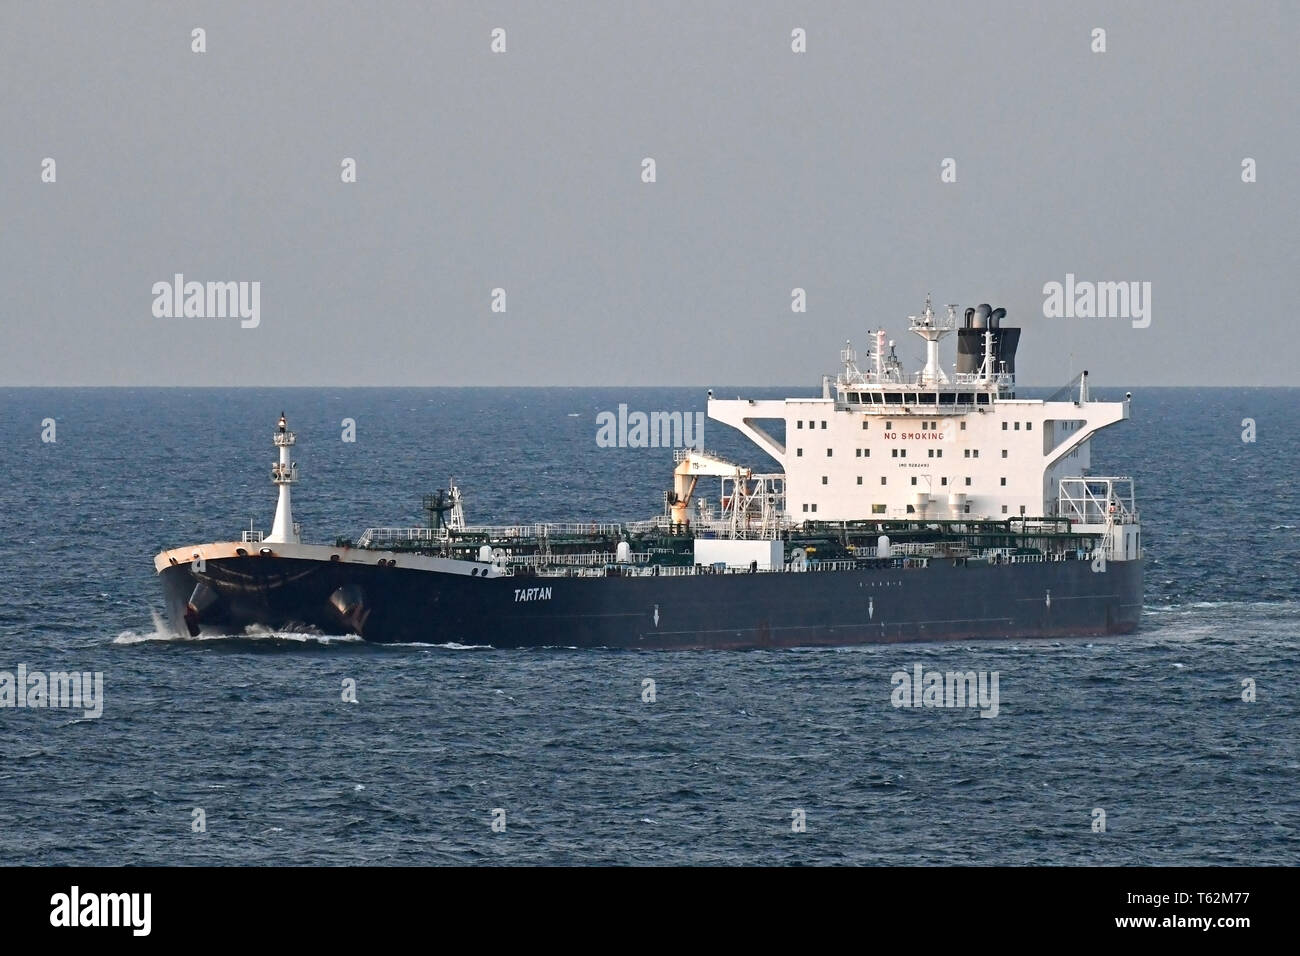 Petrolero de crudo Tartan Imagen De Stock